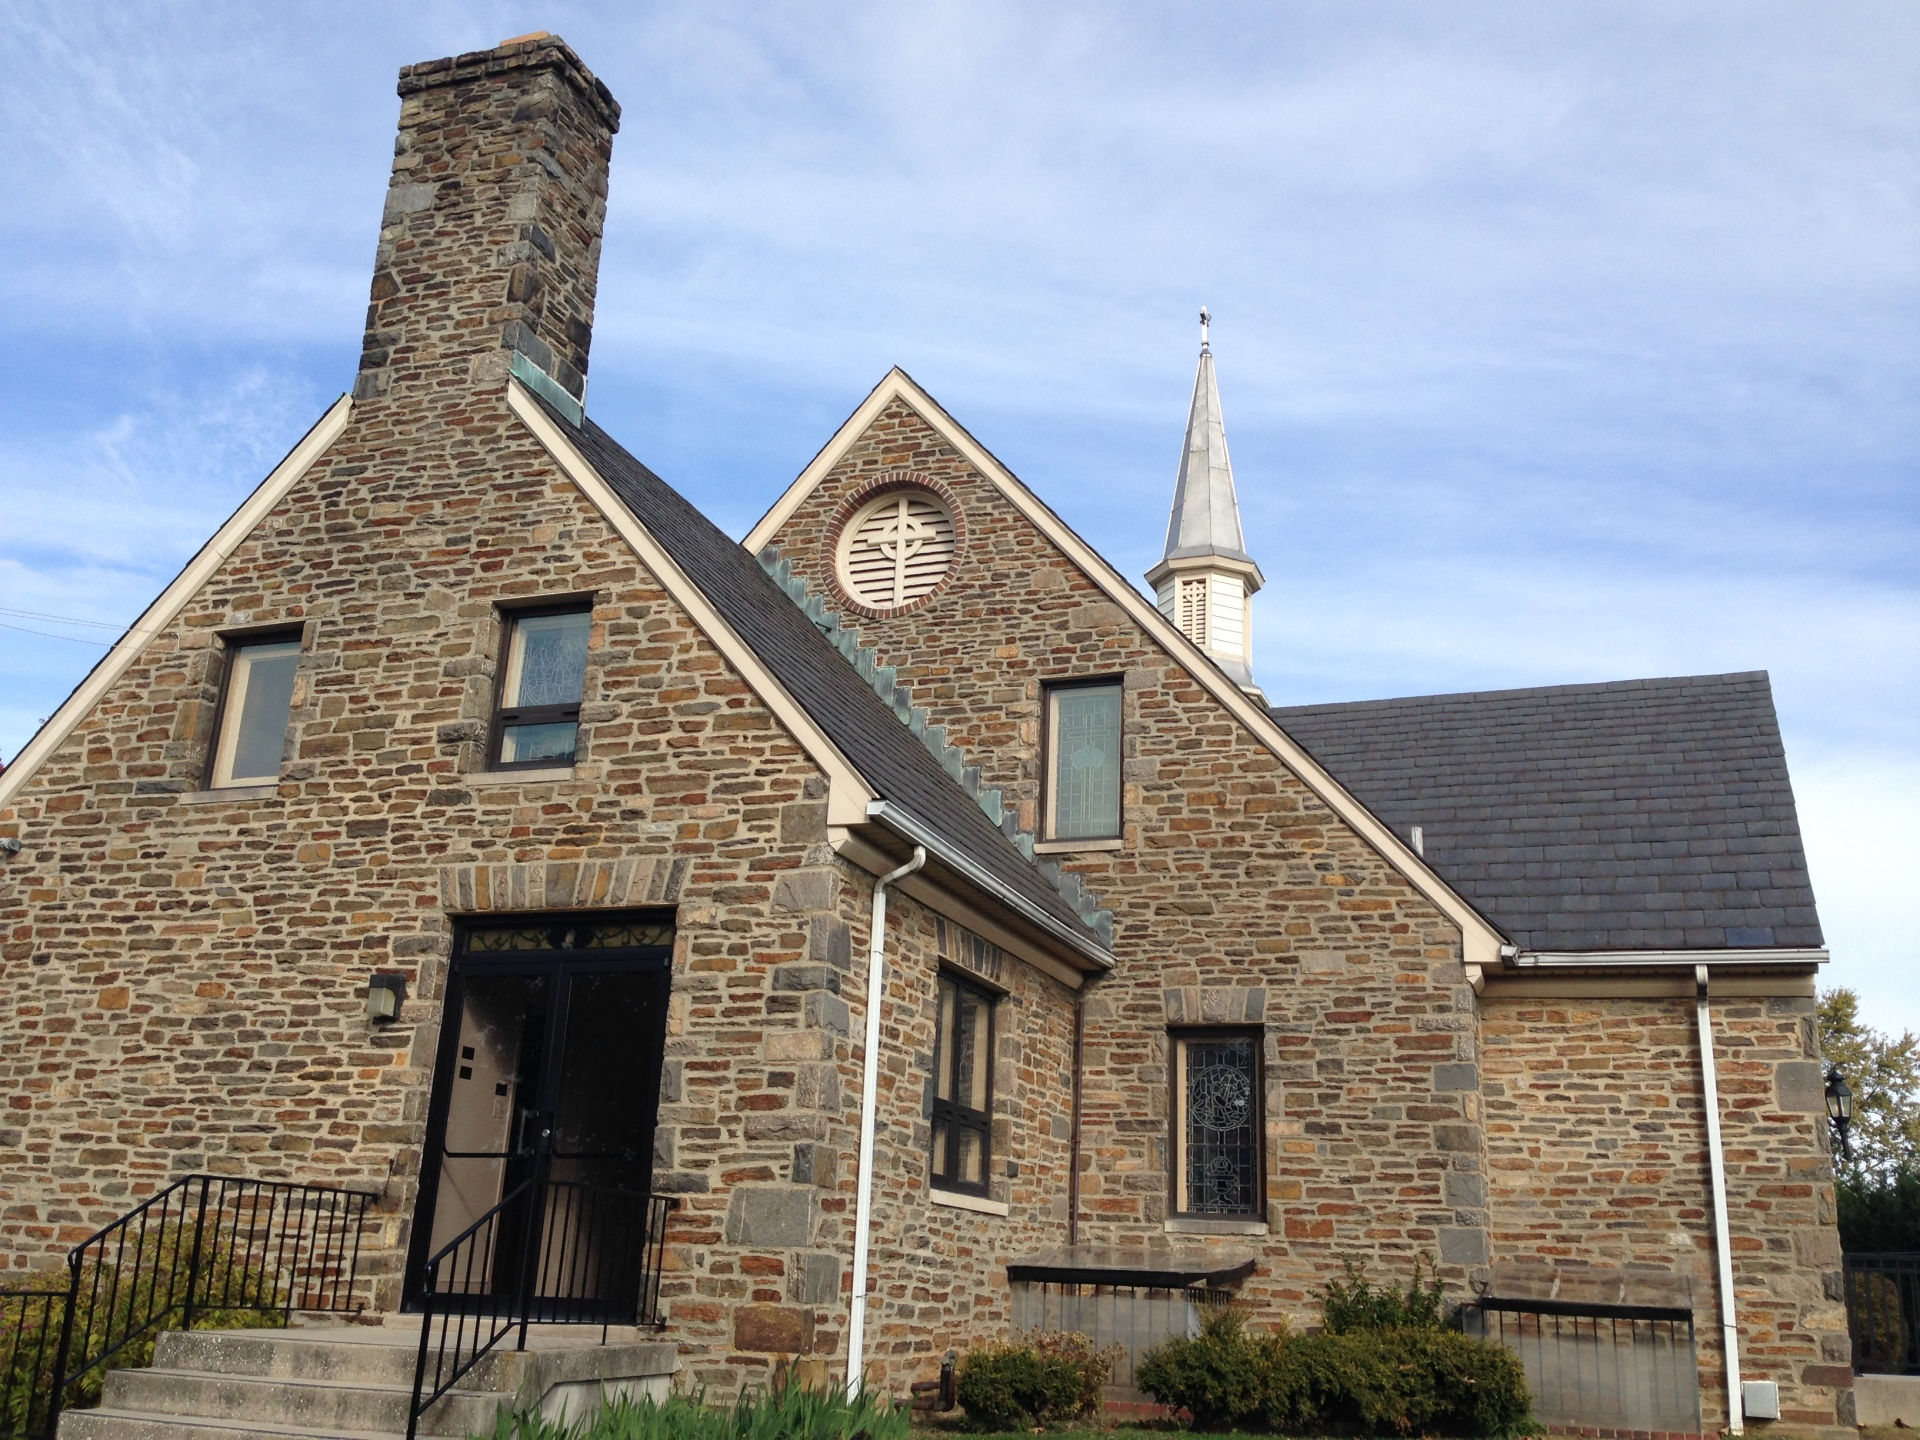 Church building entrance